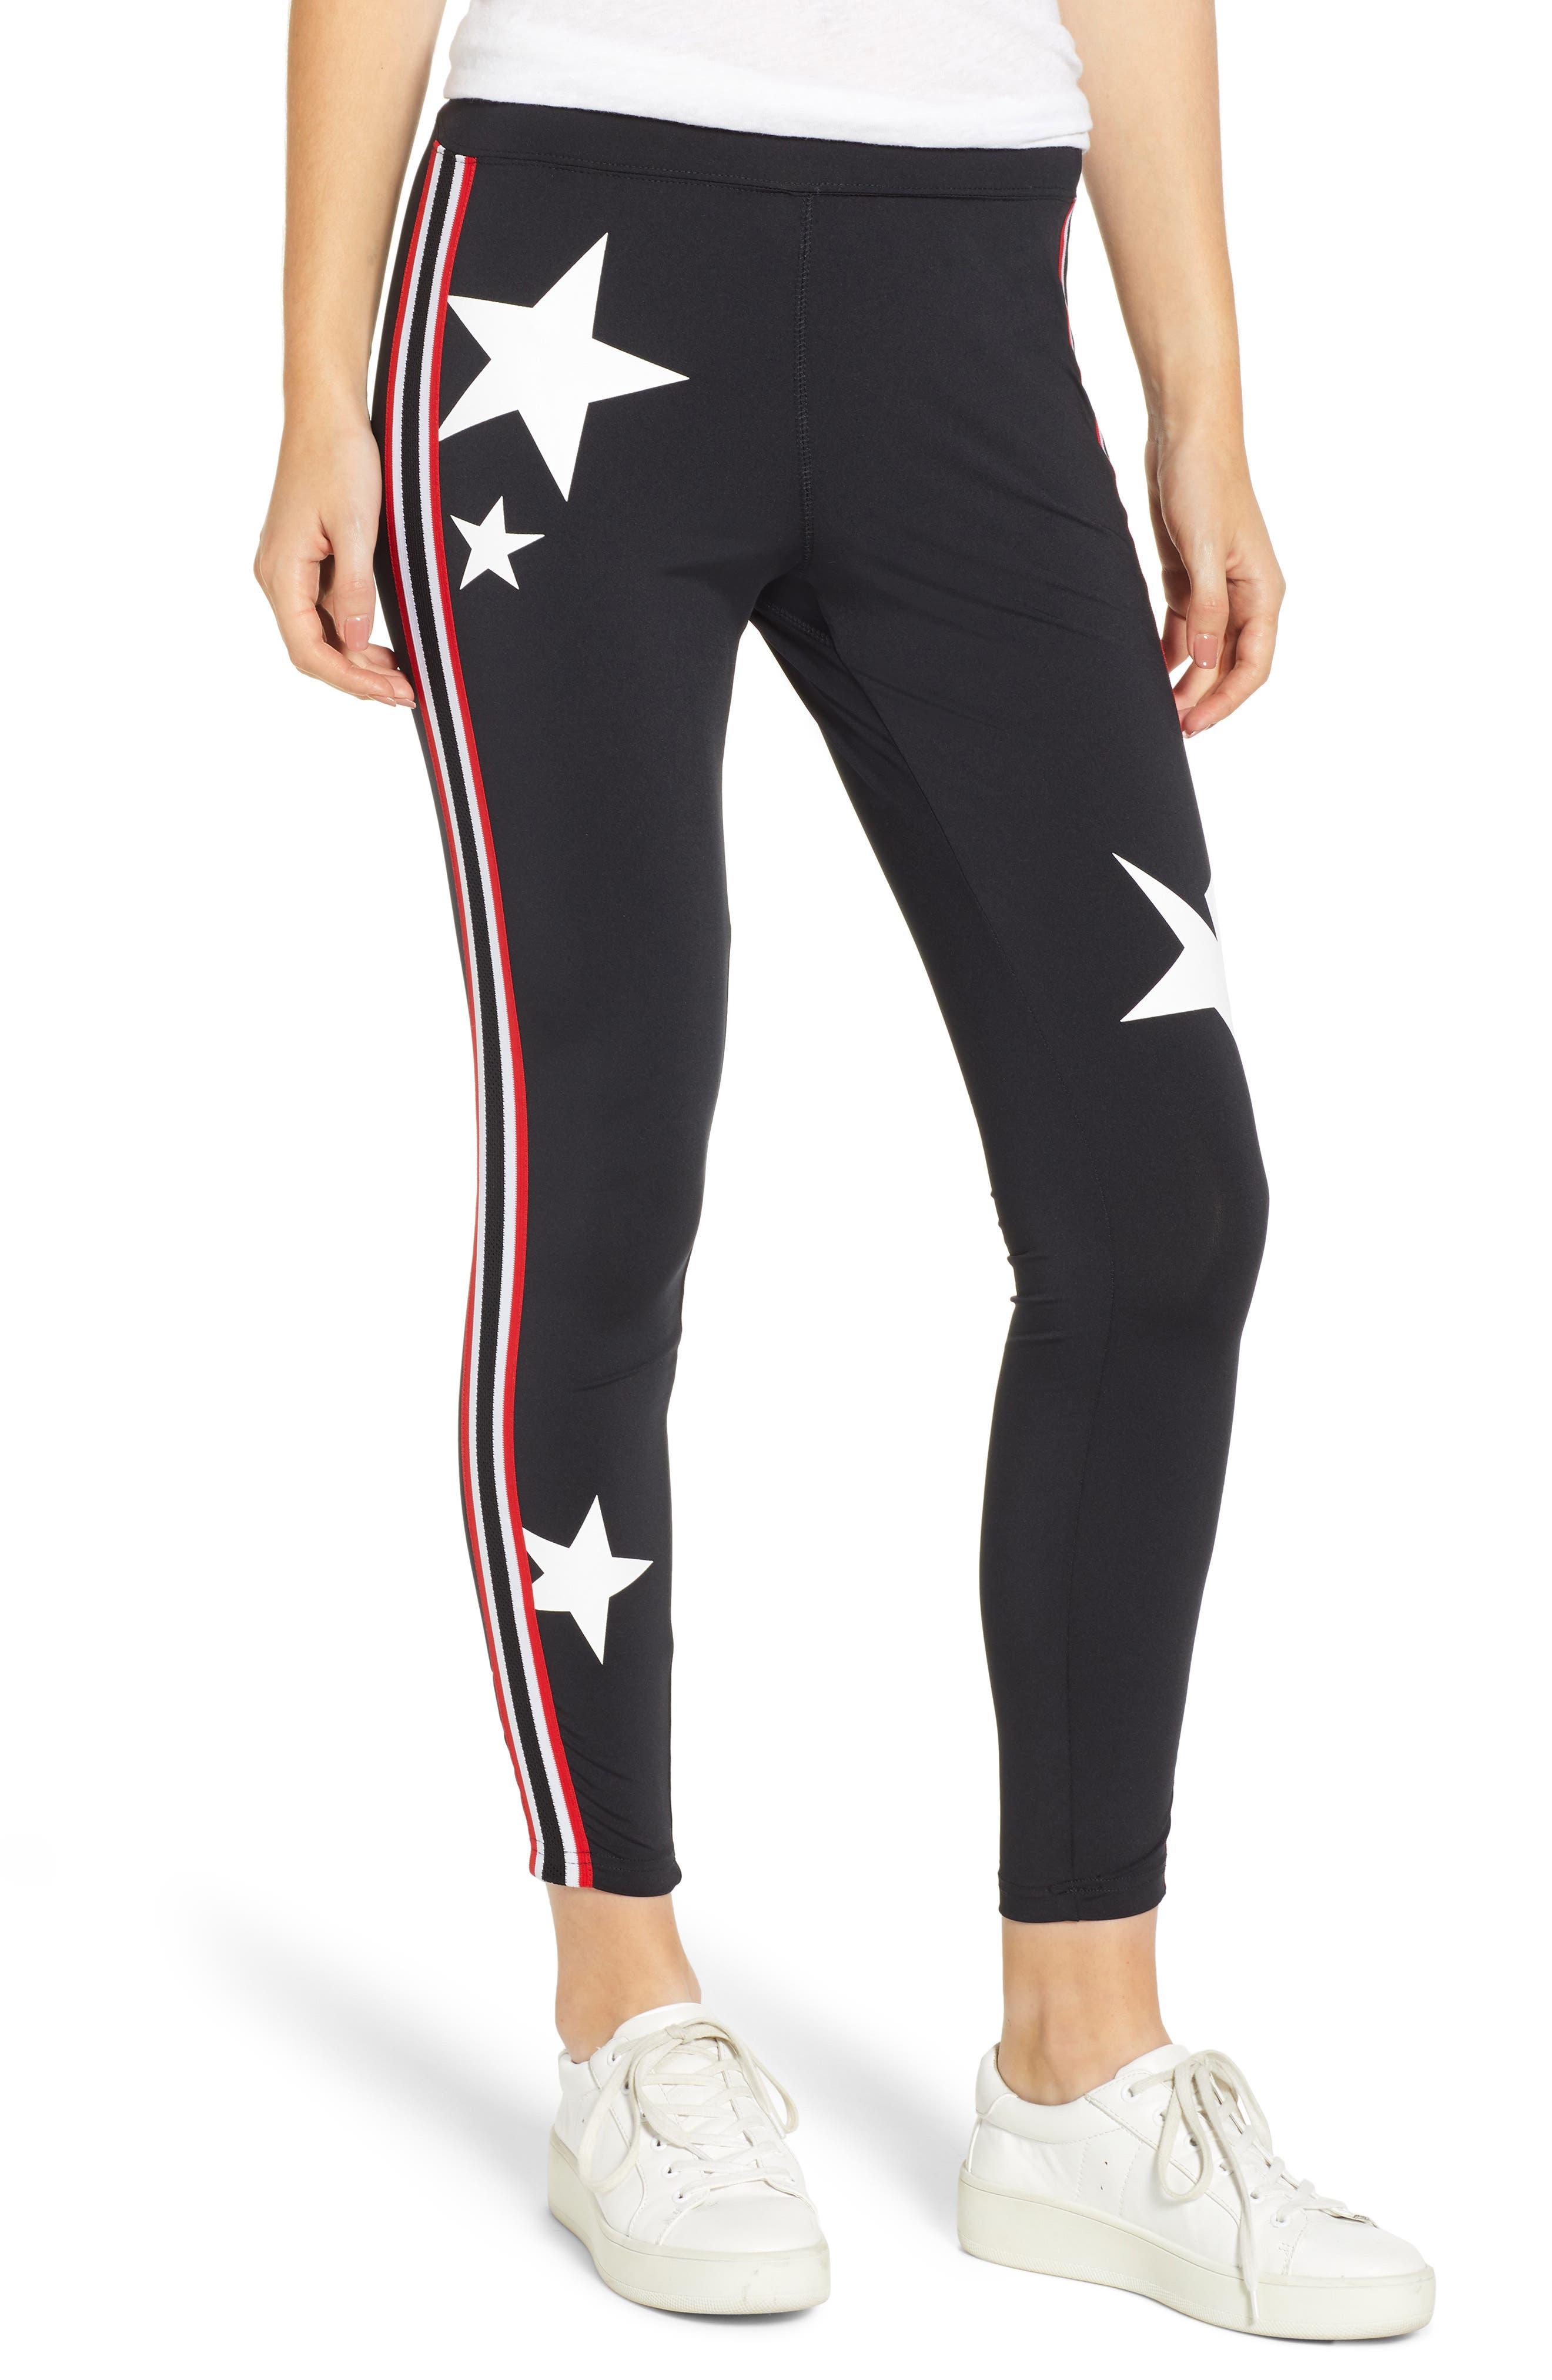 Pam & Gela Star & Stripe Leggings, Size Petite - Black